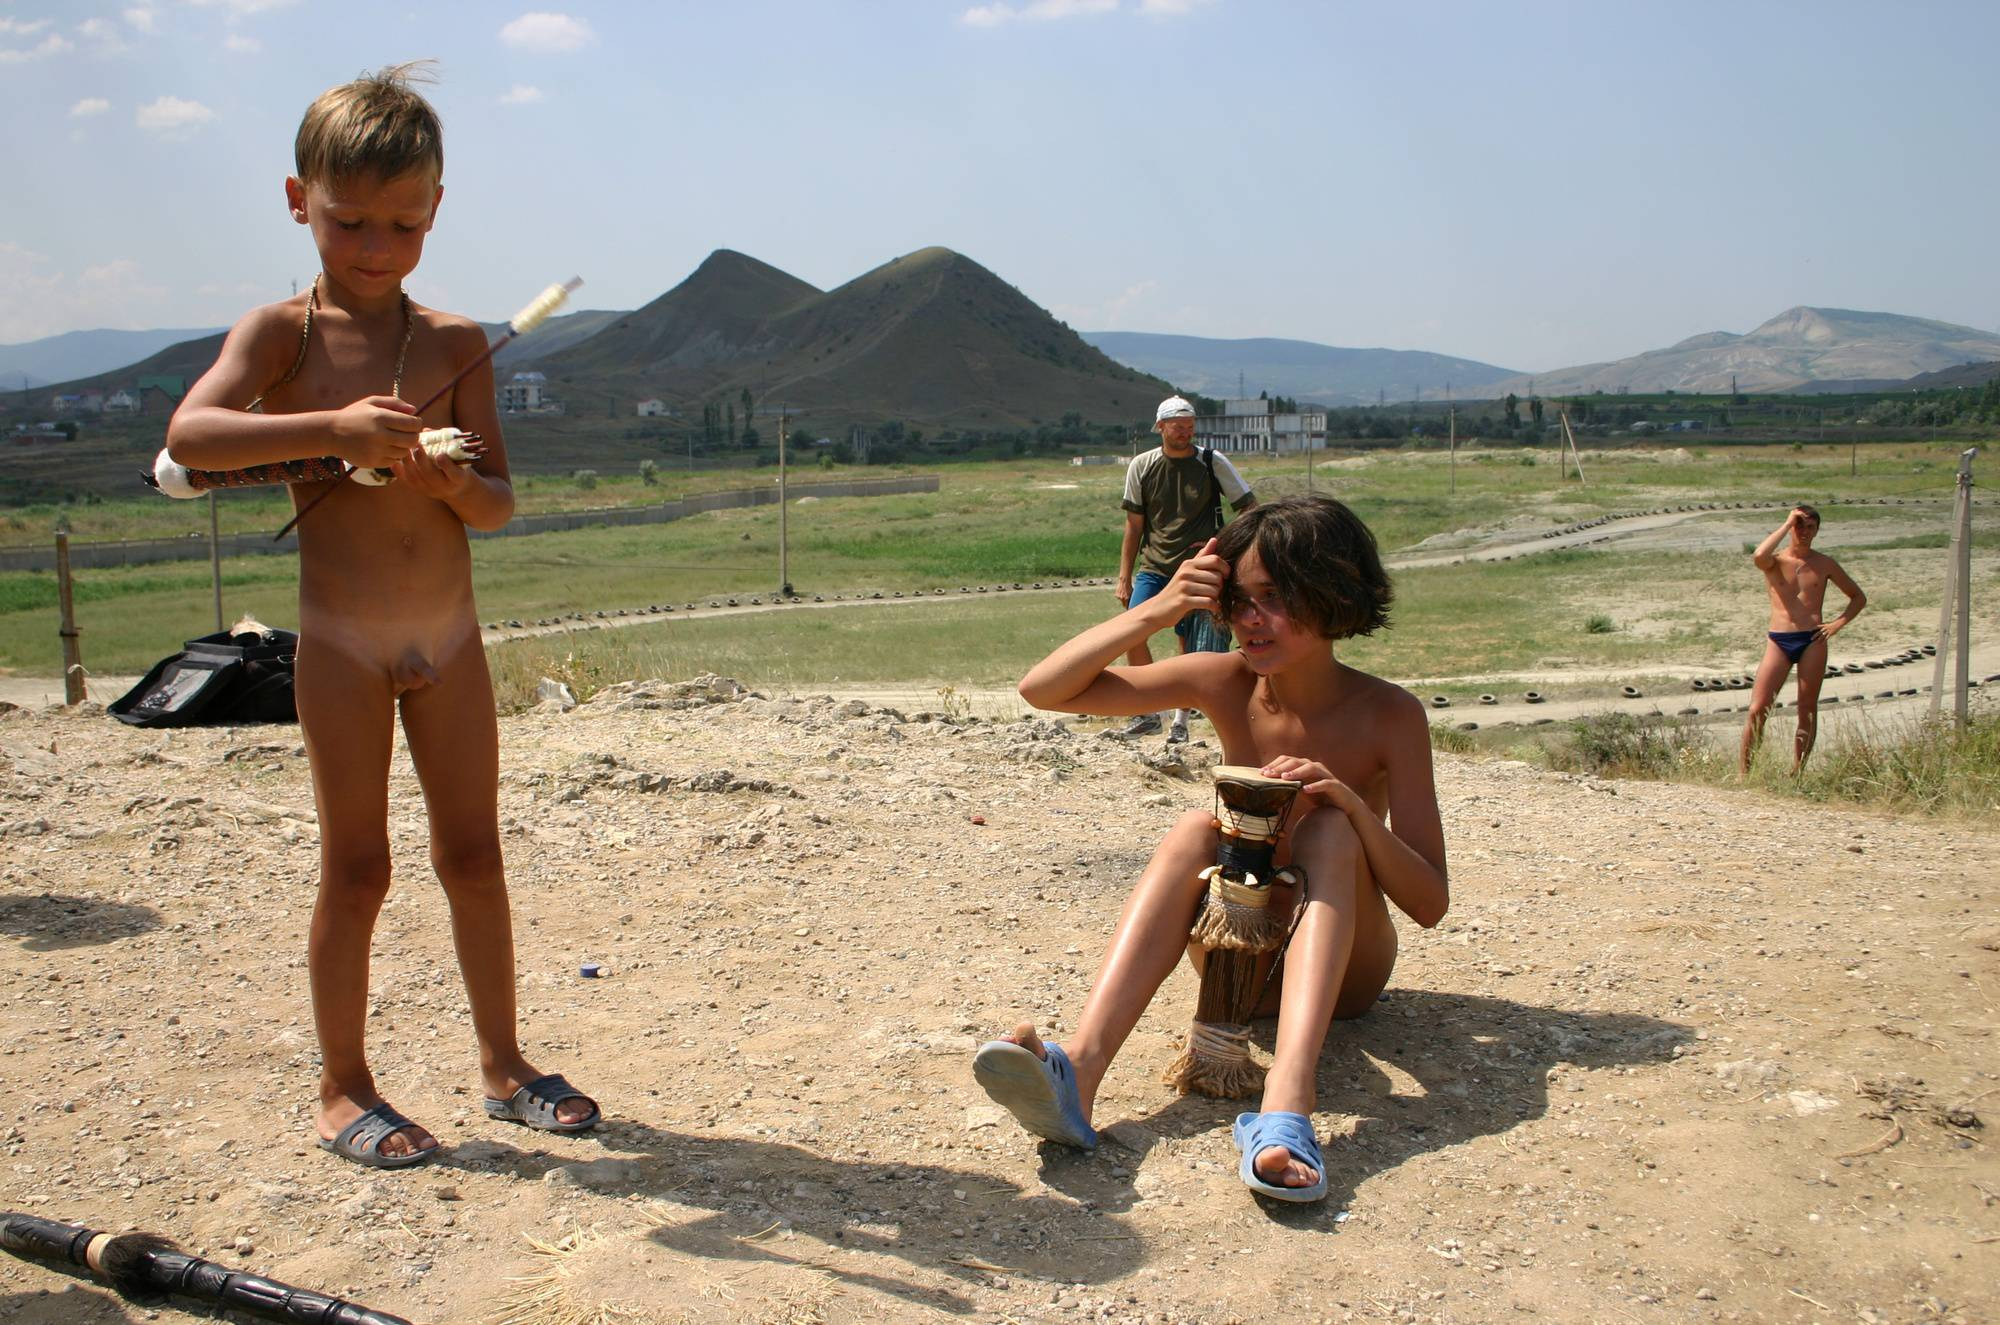 Pure Nudism Images-Crimea Nudist Drum Show - 1